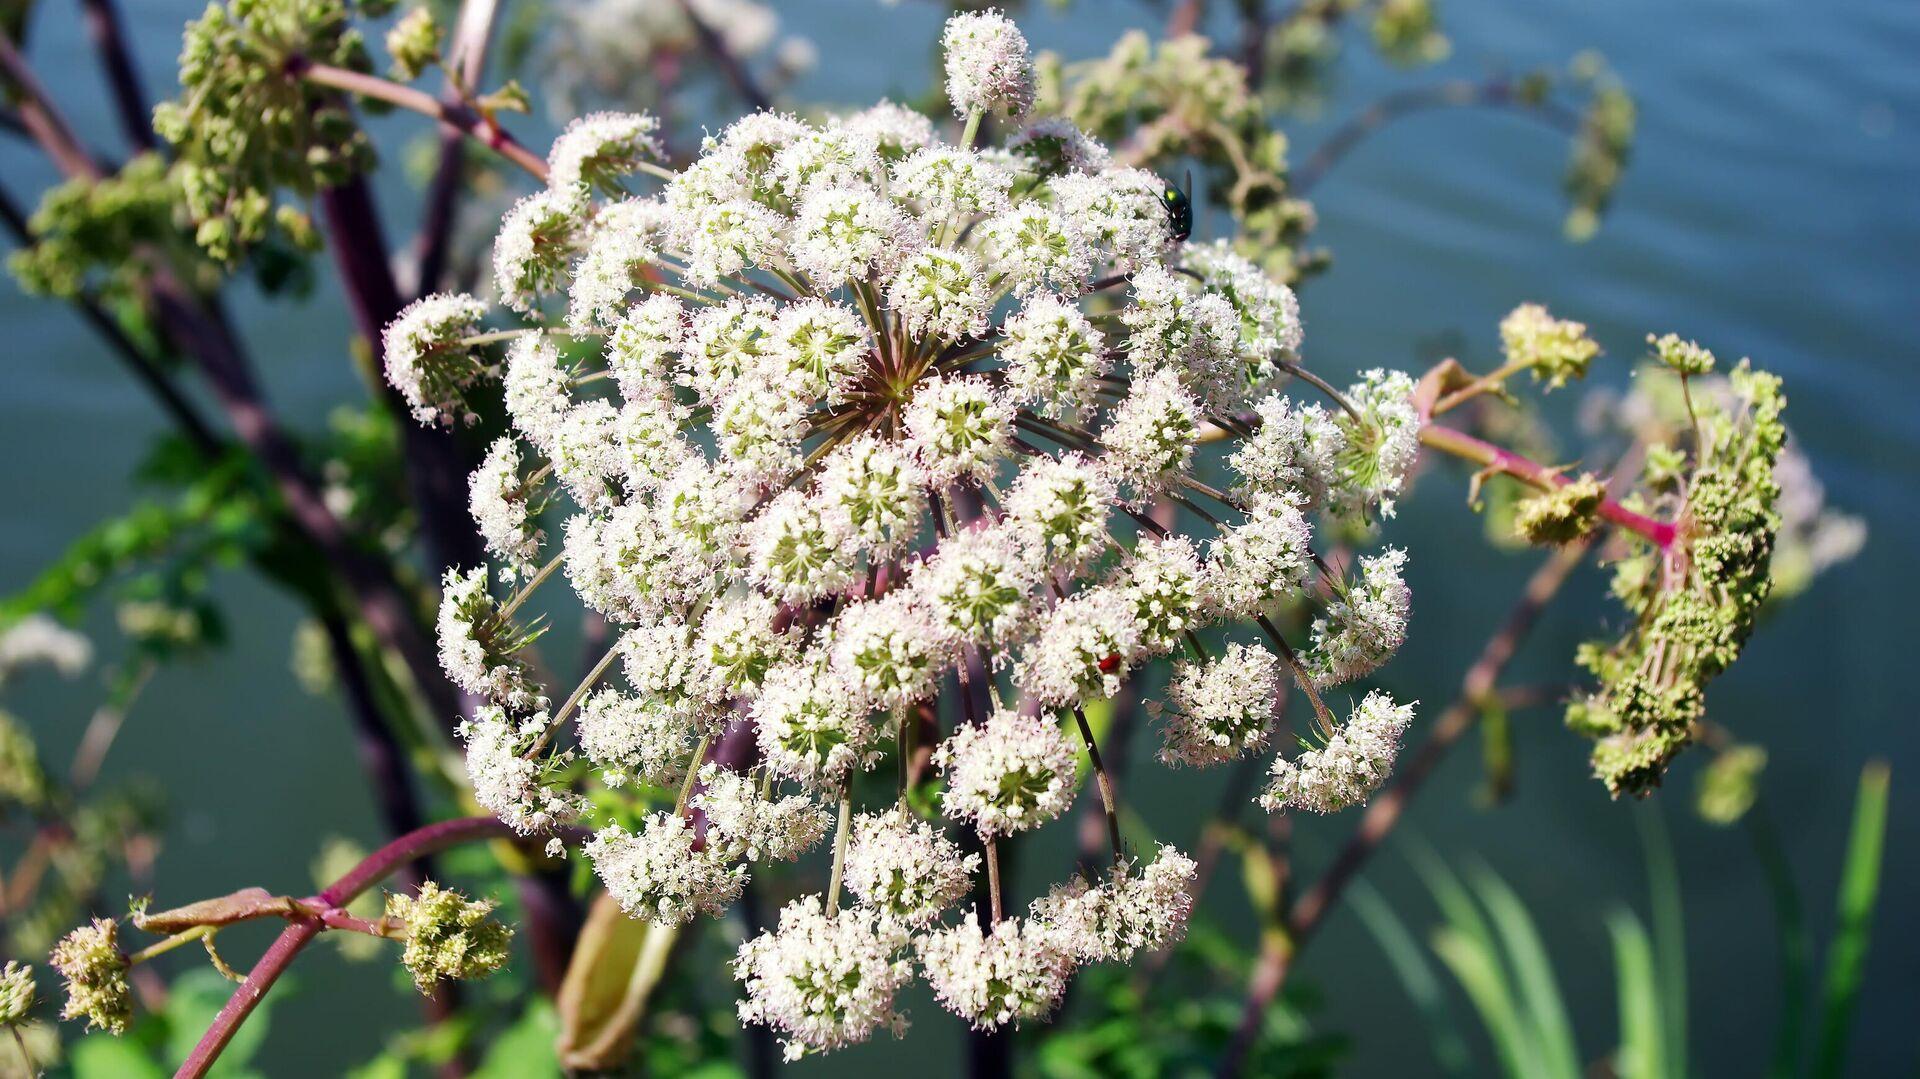 Panace di Mantegazza (nome scientifico Heracleum mantegazzianum), pianta ustionante - Sputnik Italia, 1920, 12.07.2021